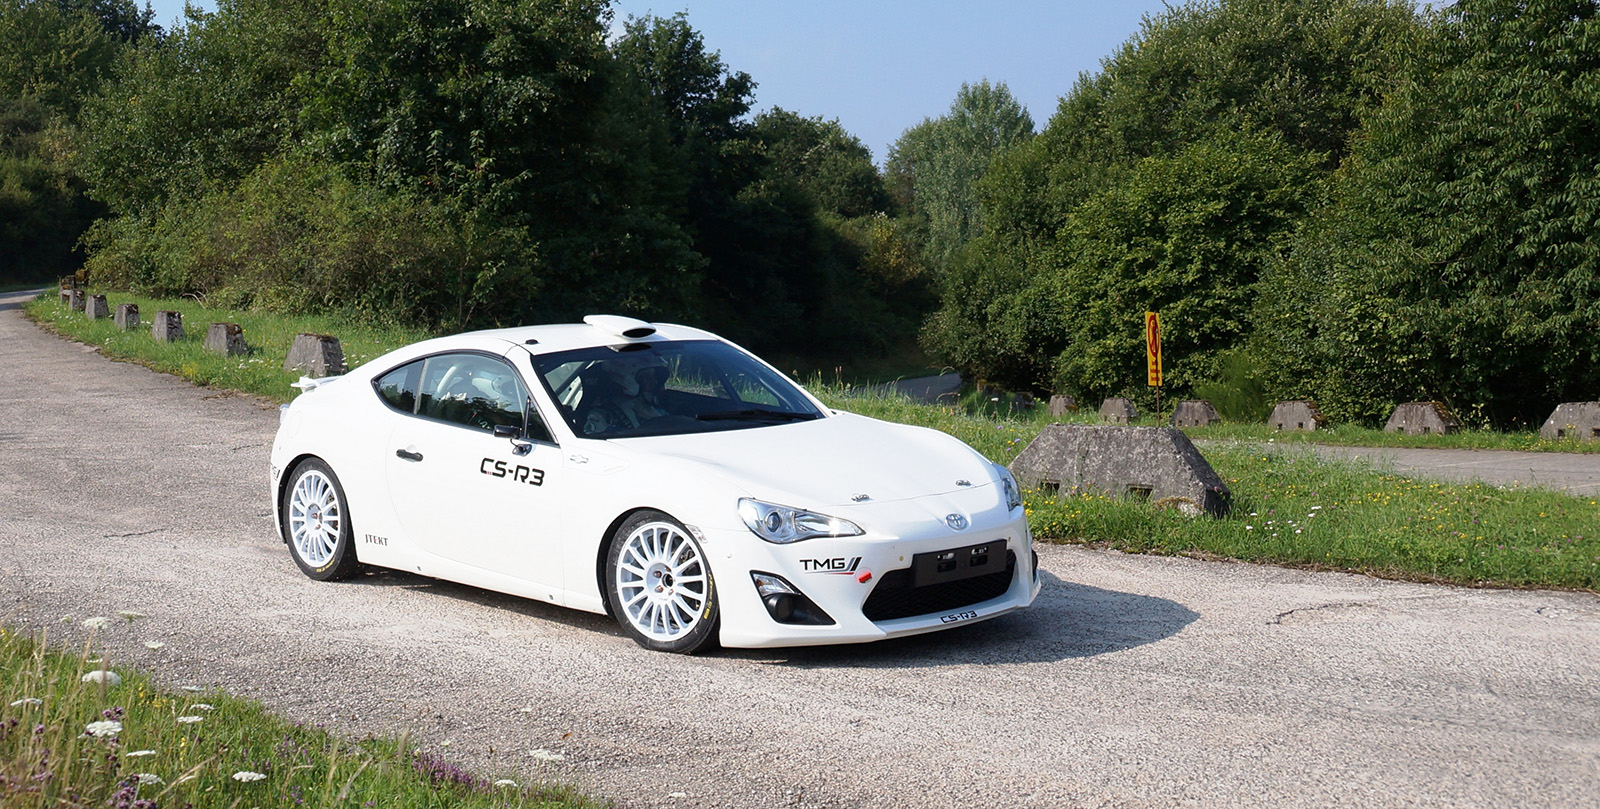 TMG_Motorsport_GT86 CS-R3_Test_1